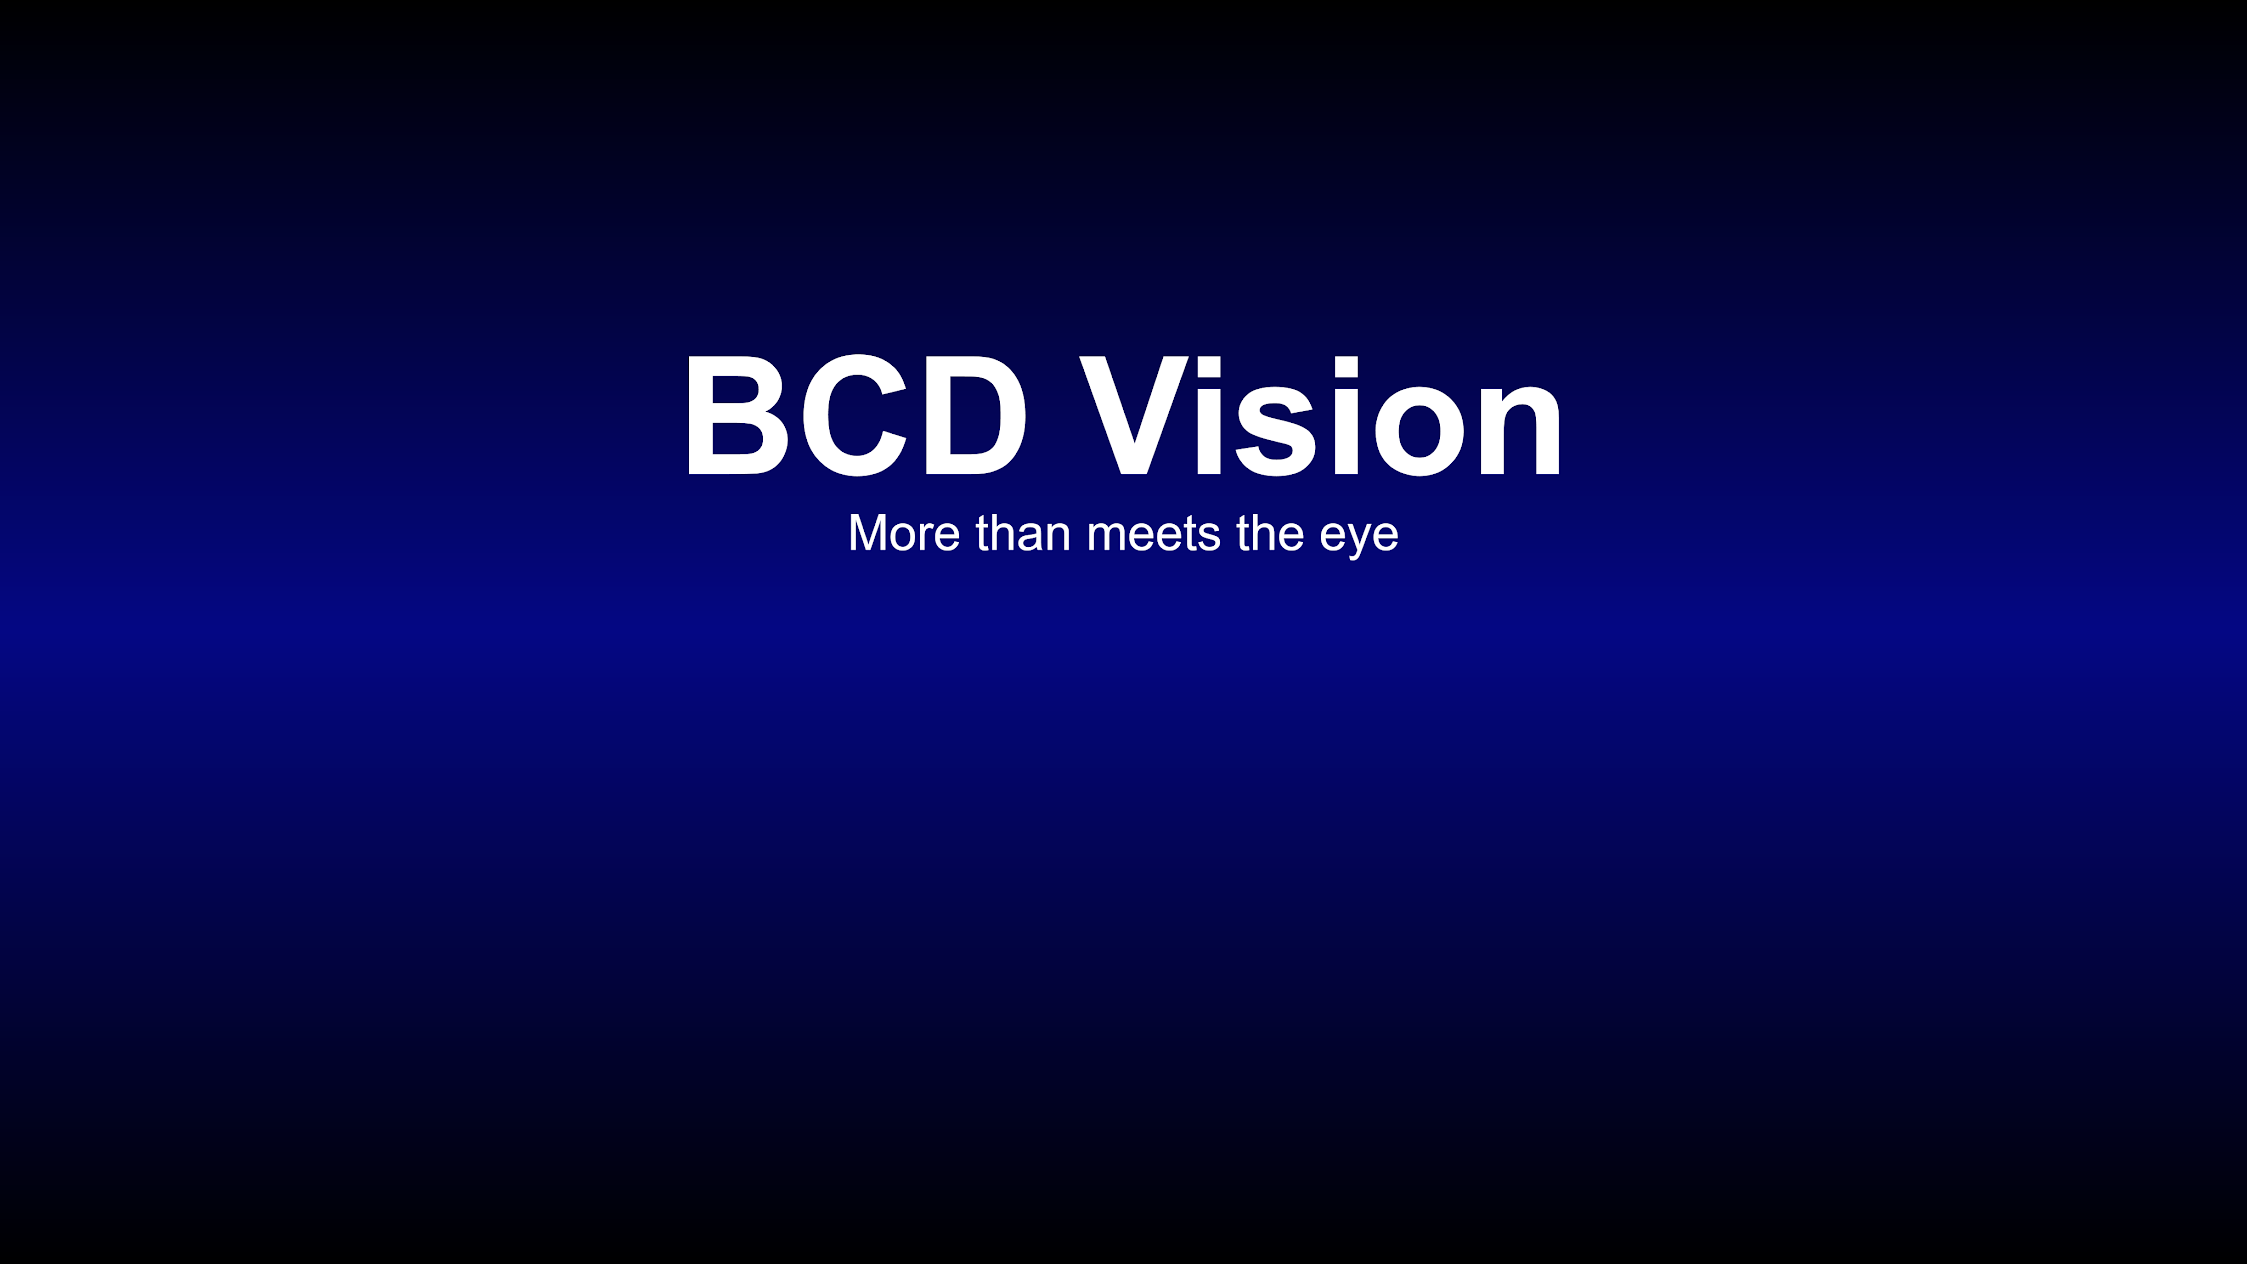 BCD Vision